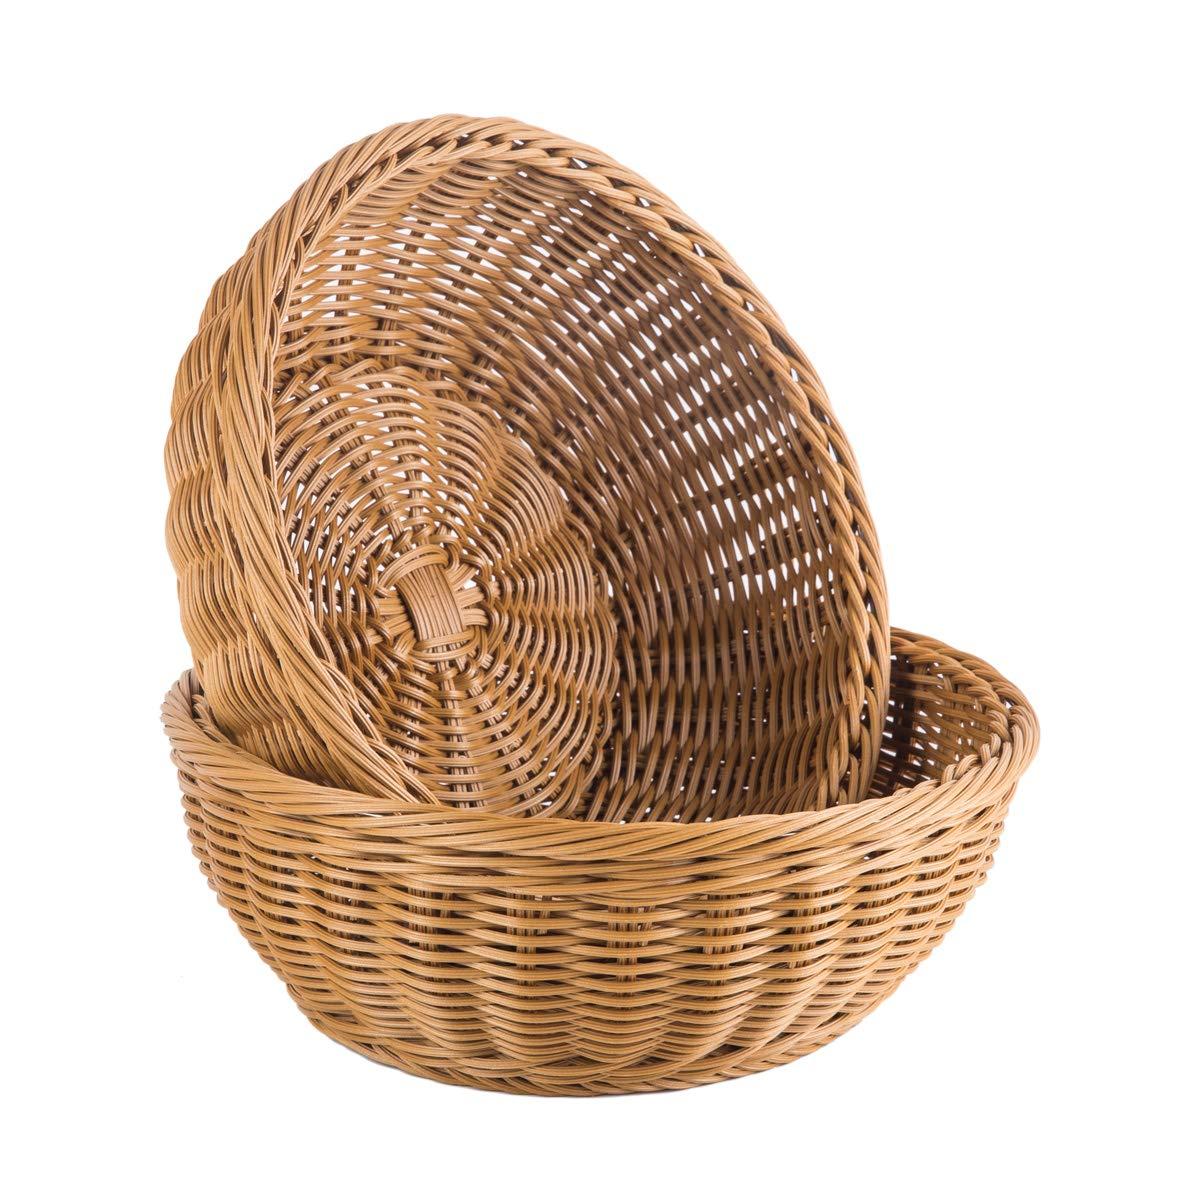 Woven Bread Basket Poly-Wicker Round Stackable Basket Tabletop Food Fruit Vegetables Serving Basket (Round,2pcs)